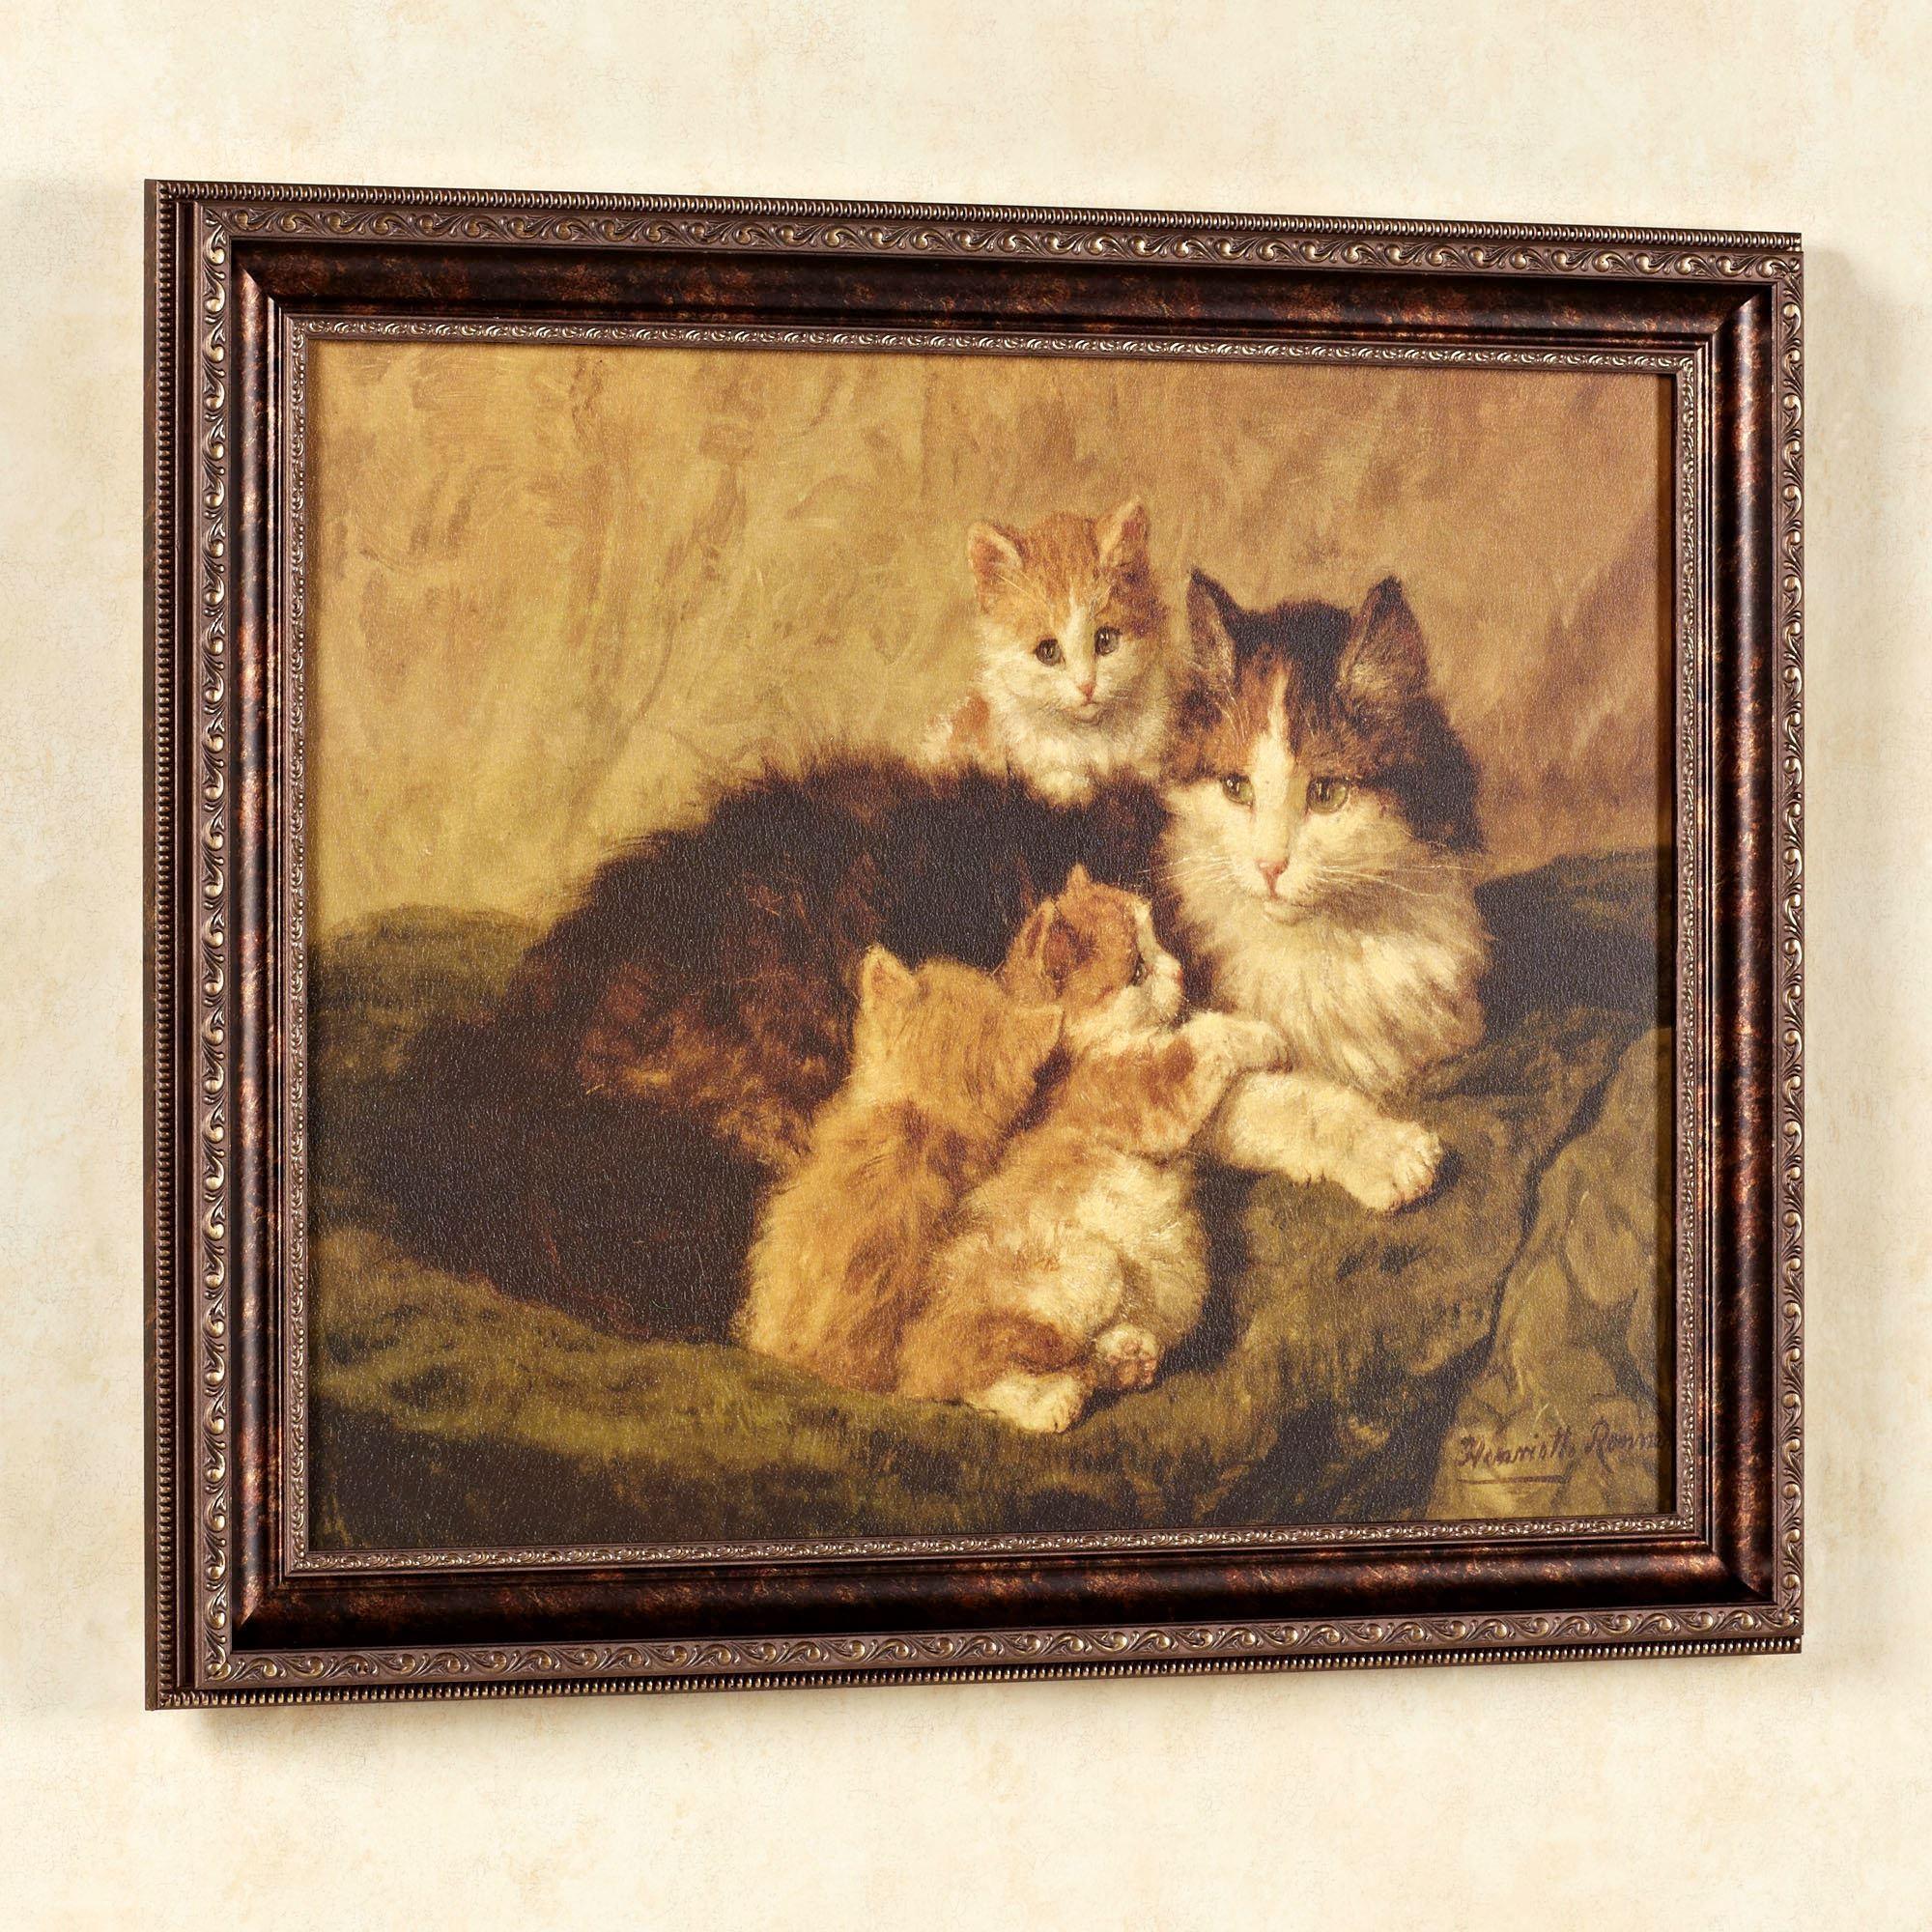 Framed Art Prints | Touch Of Class Regarding Brown Framed Wall Art (Image 5 of 20)